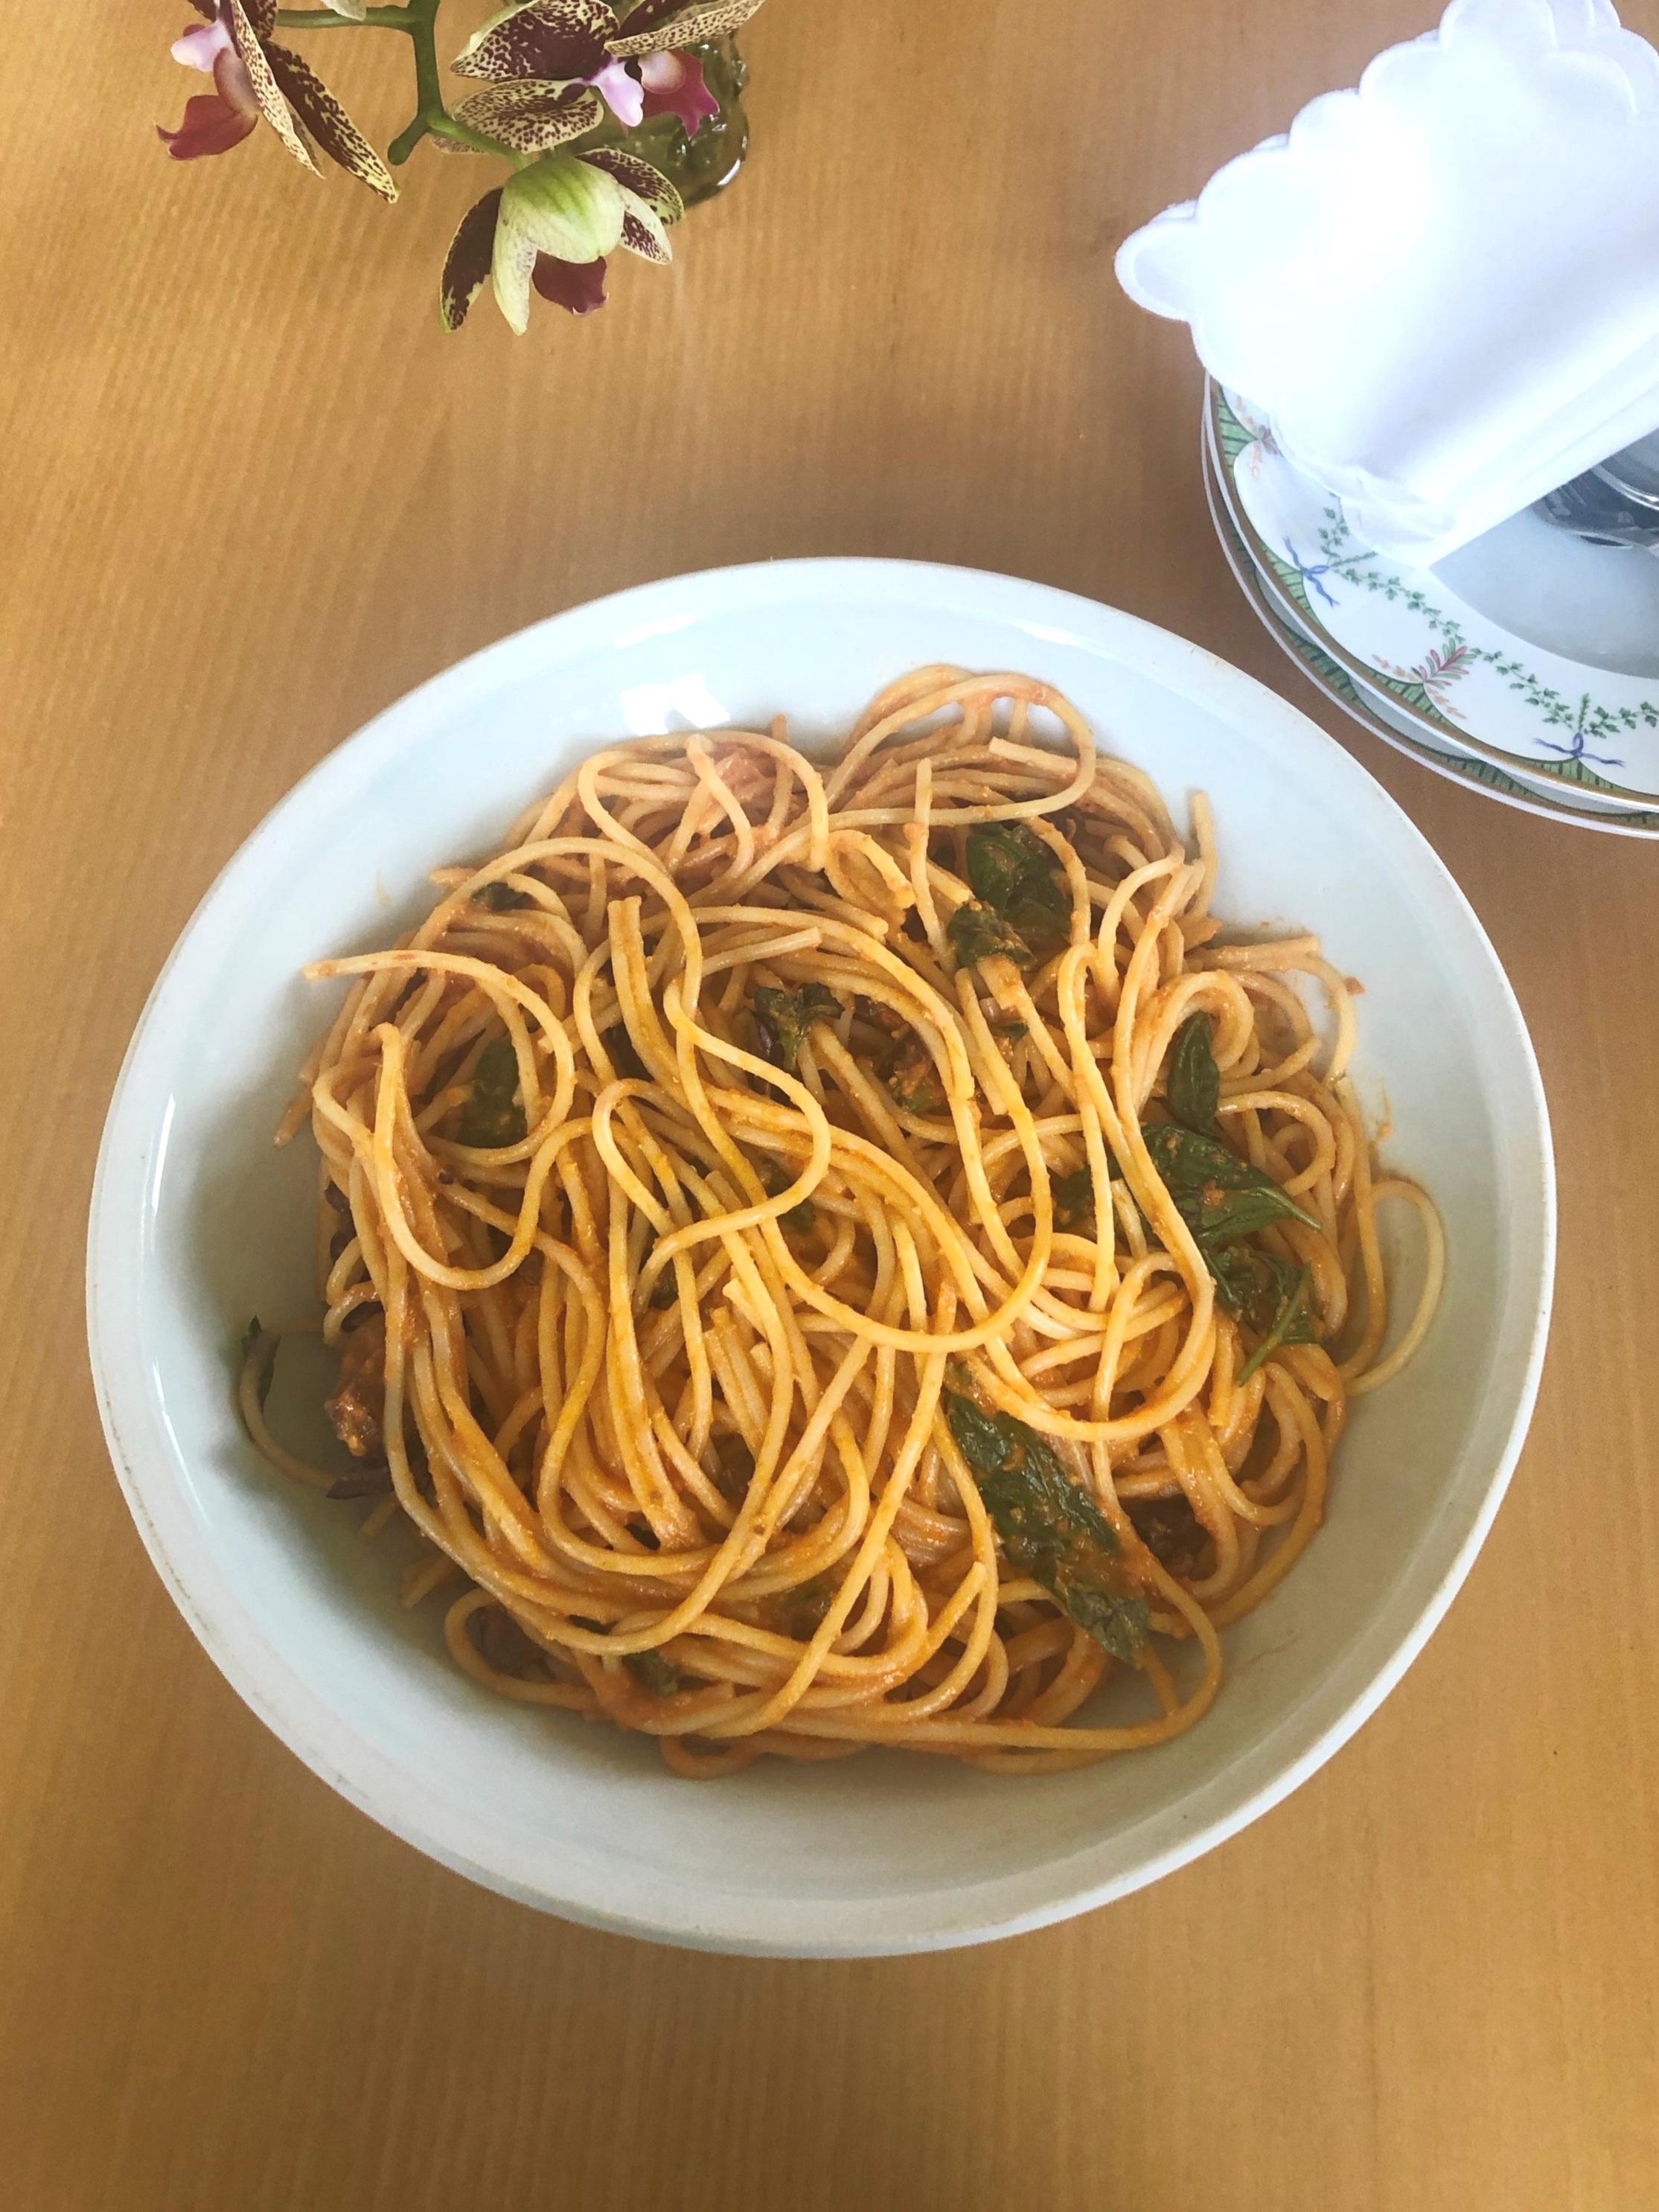 Spaghettie+with+Cherry+Tomatoes.jpg